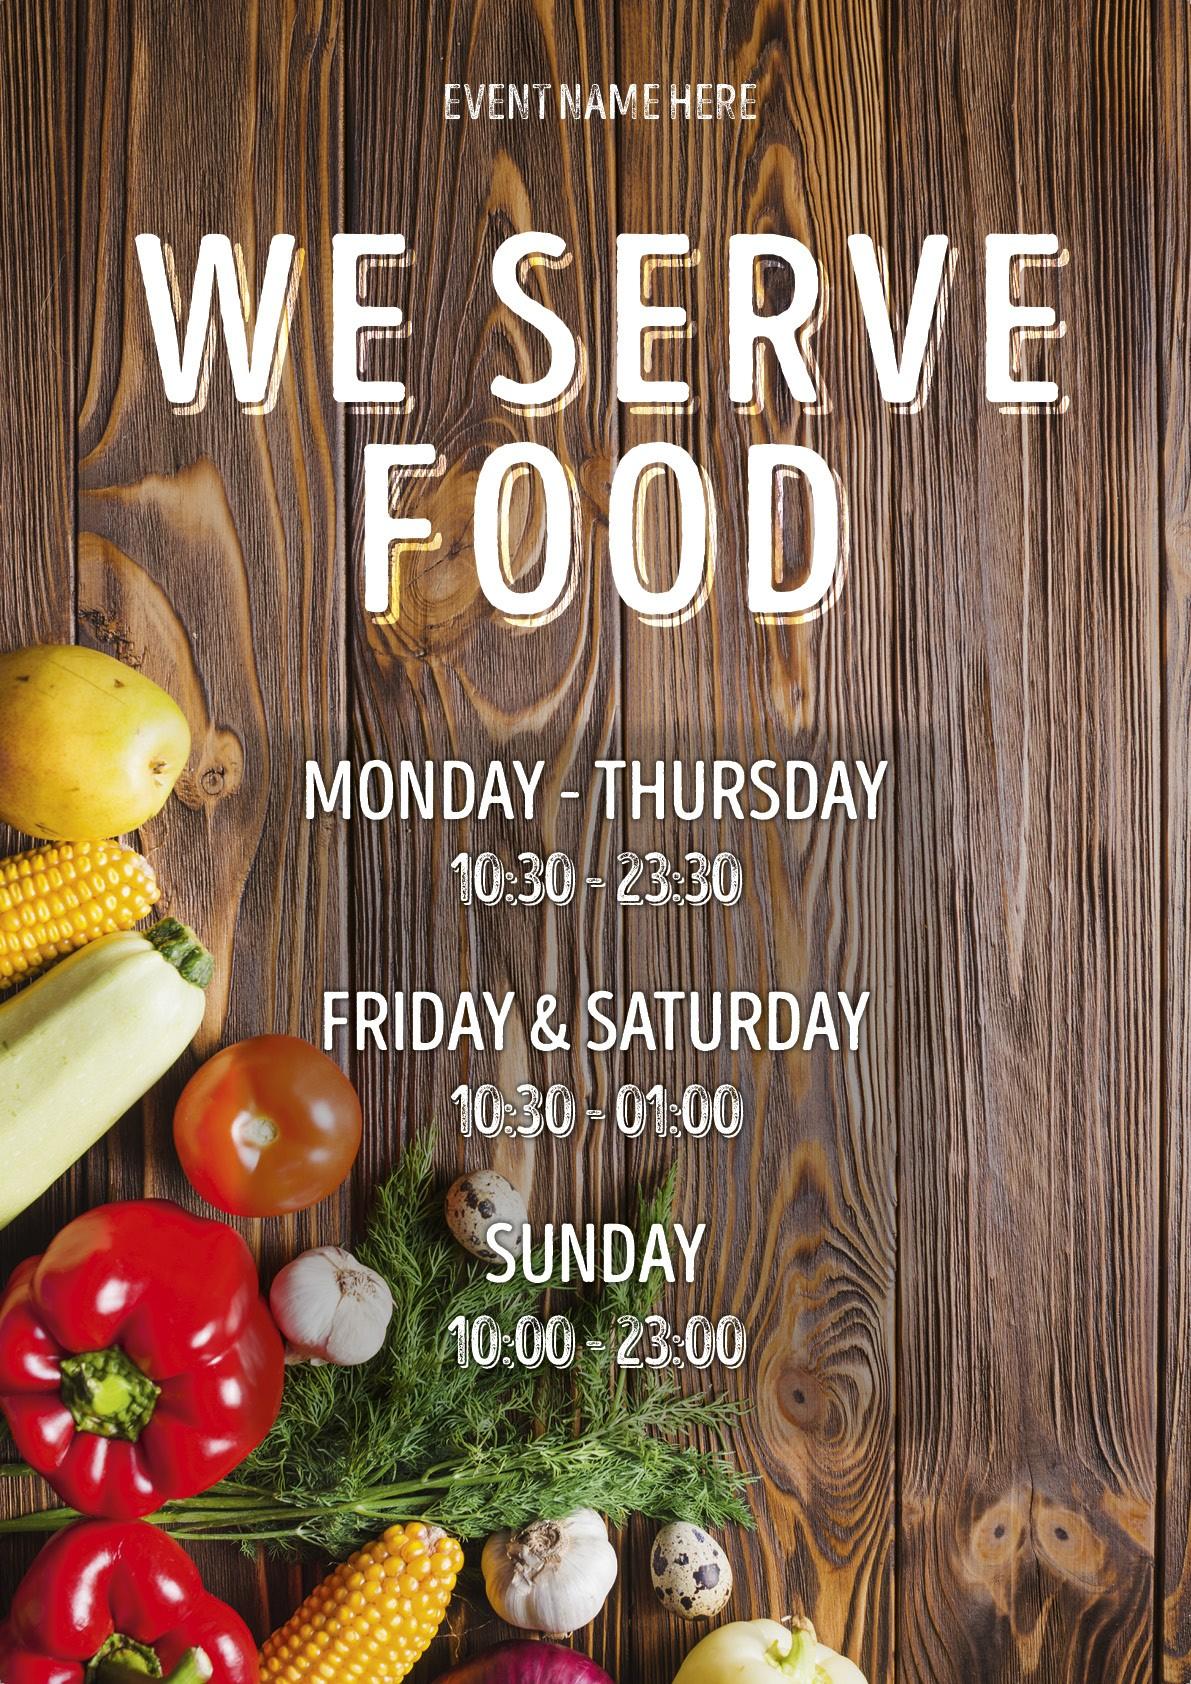 We Serve Food (times) Poster 6